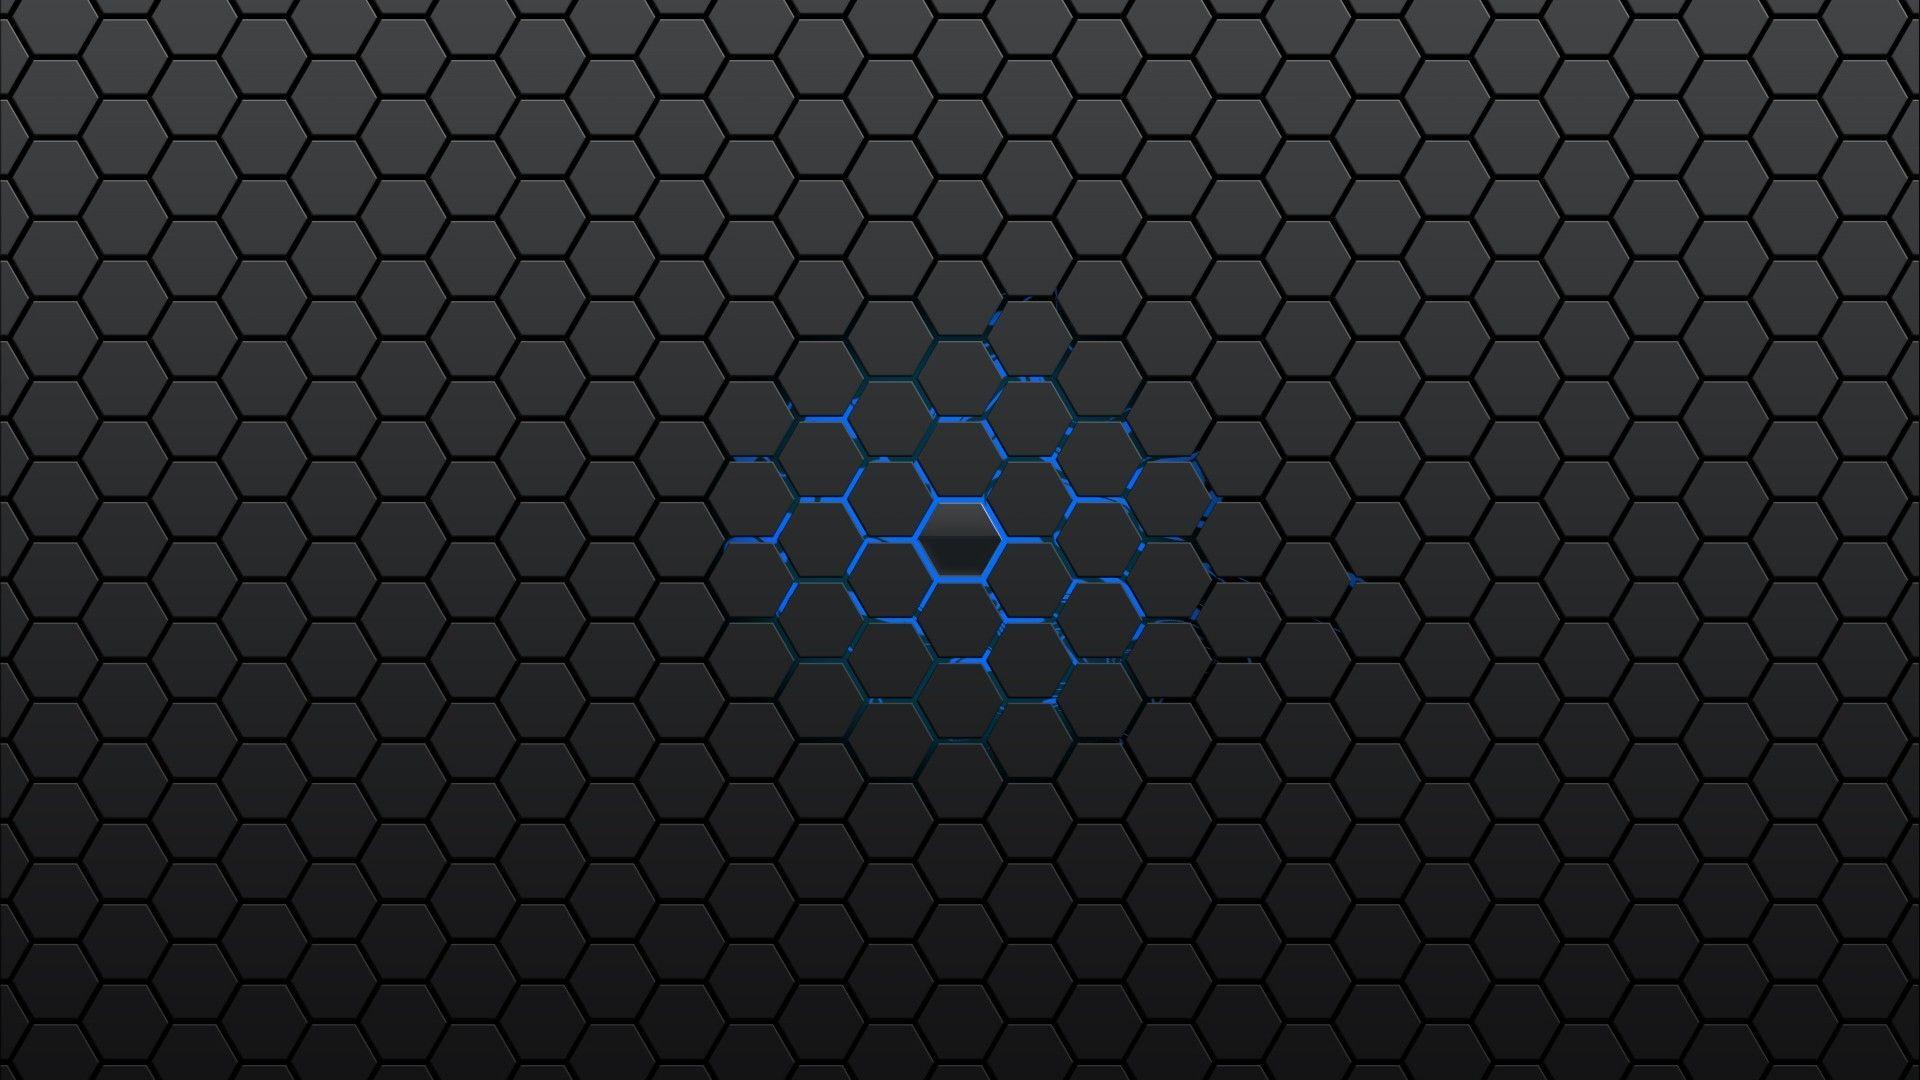 1920x1080 Geometric Pattern Wallpaper Geometric Heart Desktop Wallpaper Geometric Pattern Wallpaper Polygon Pattern Abstract